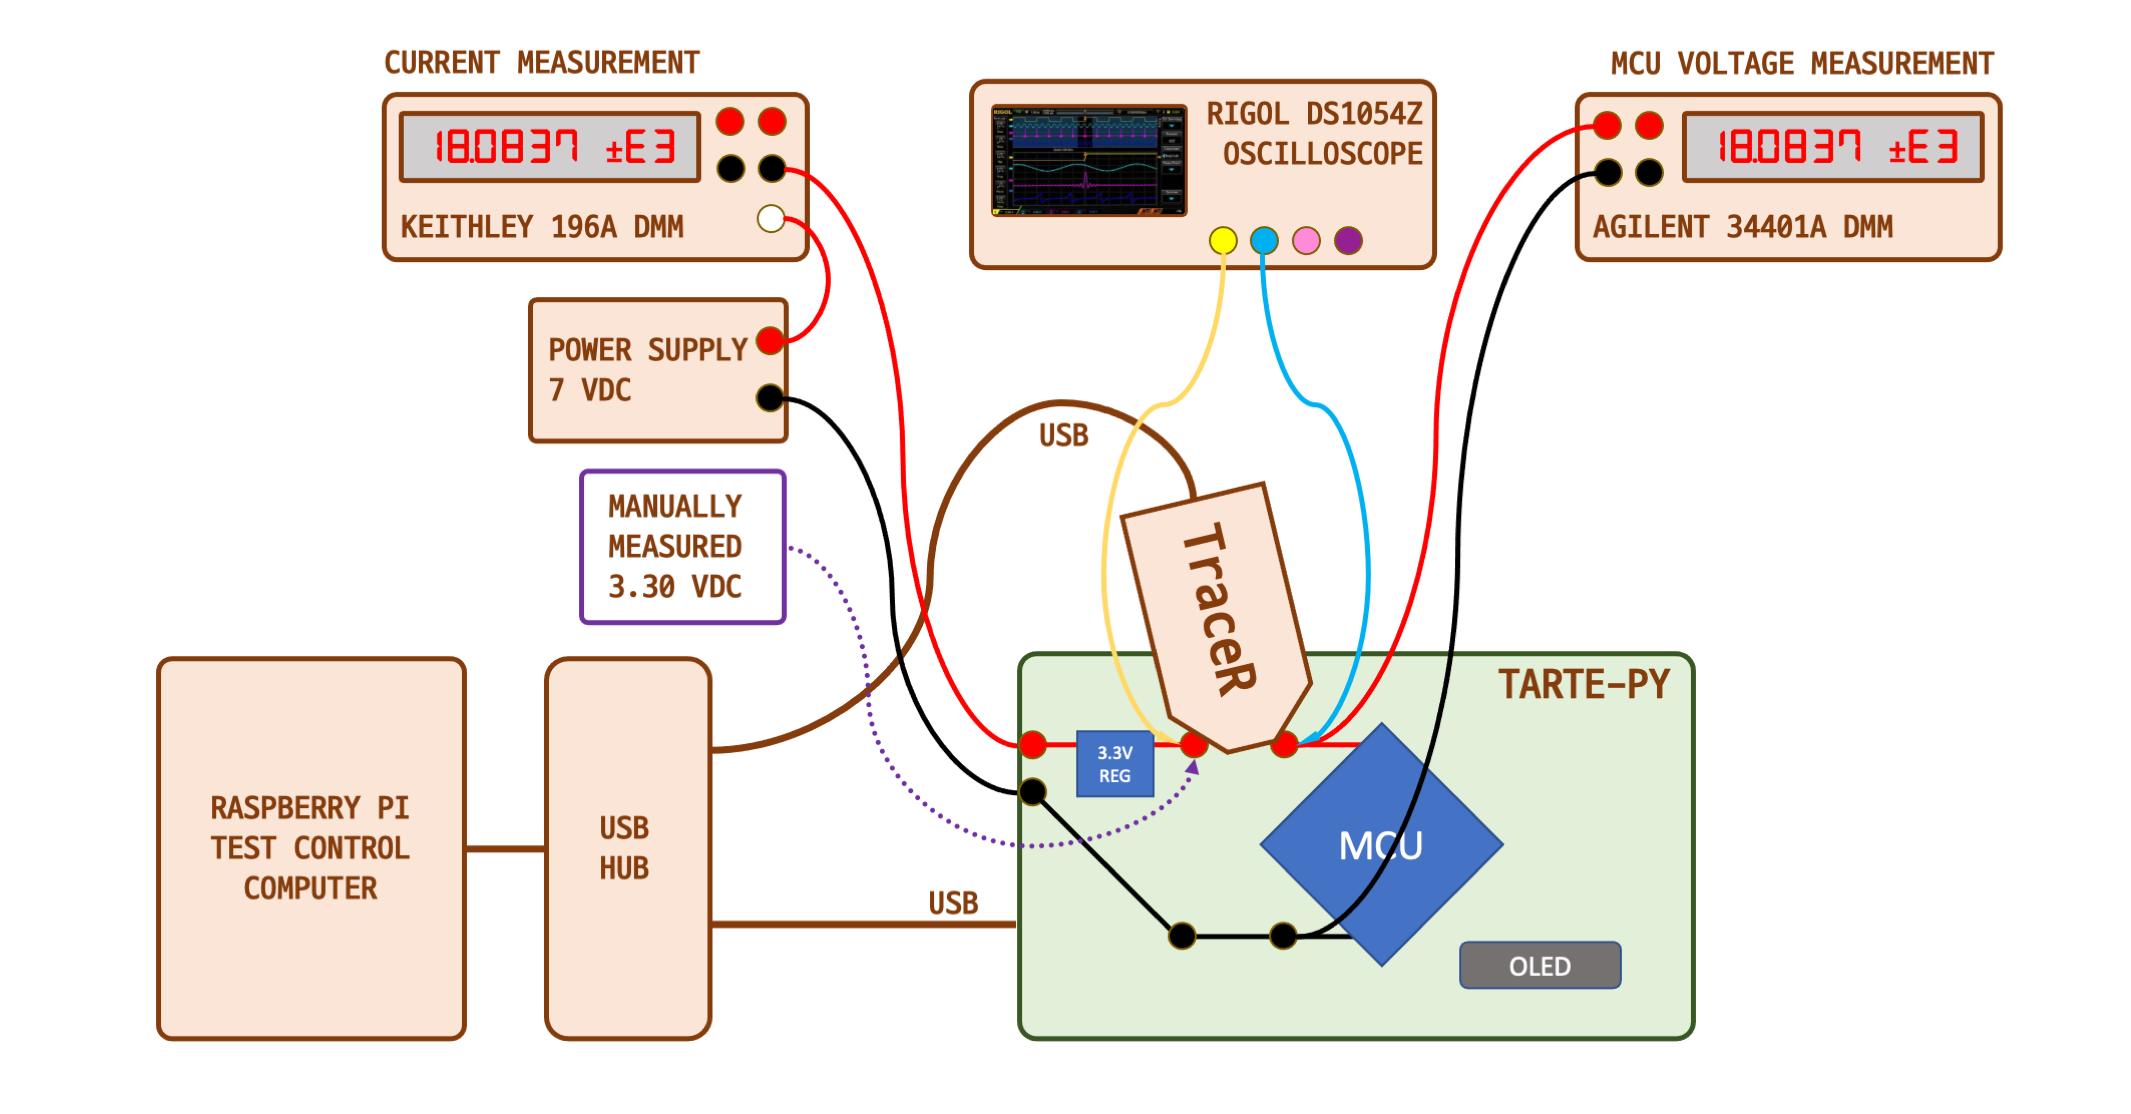 dc-performance-test-layout